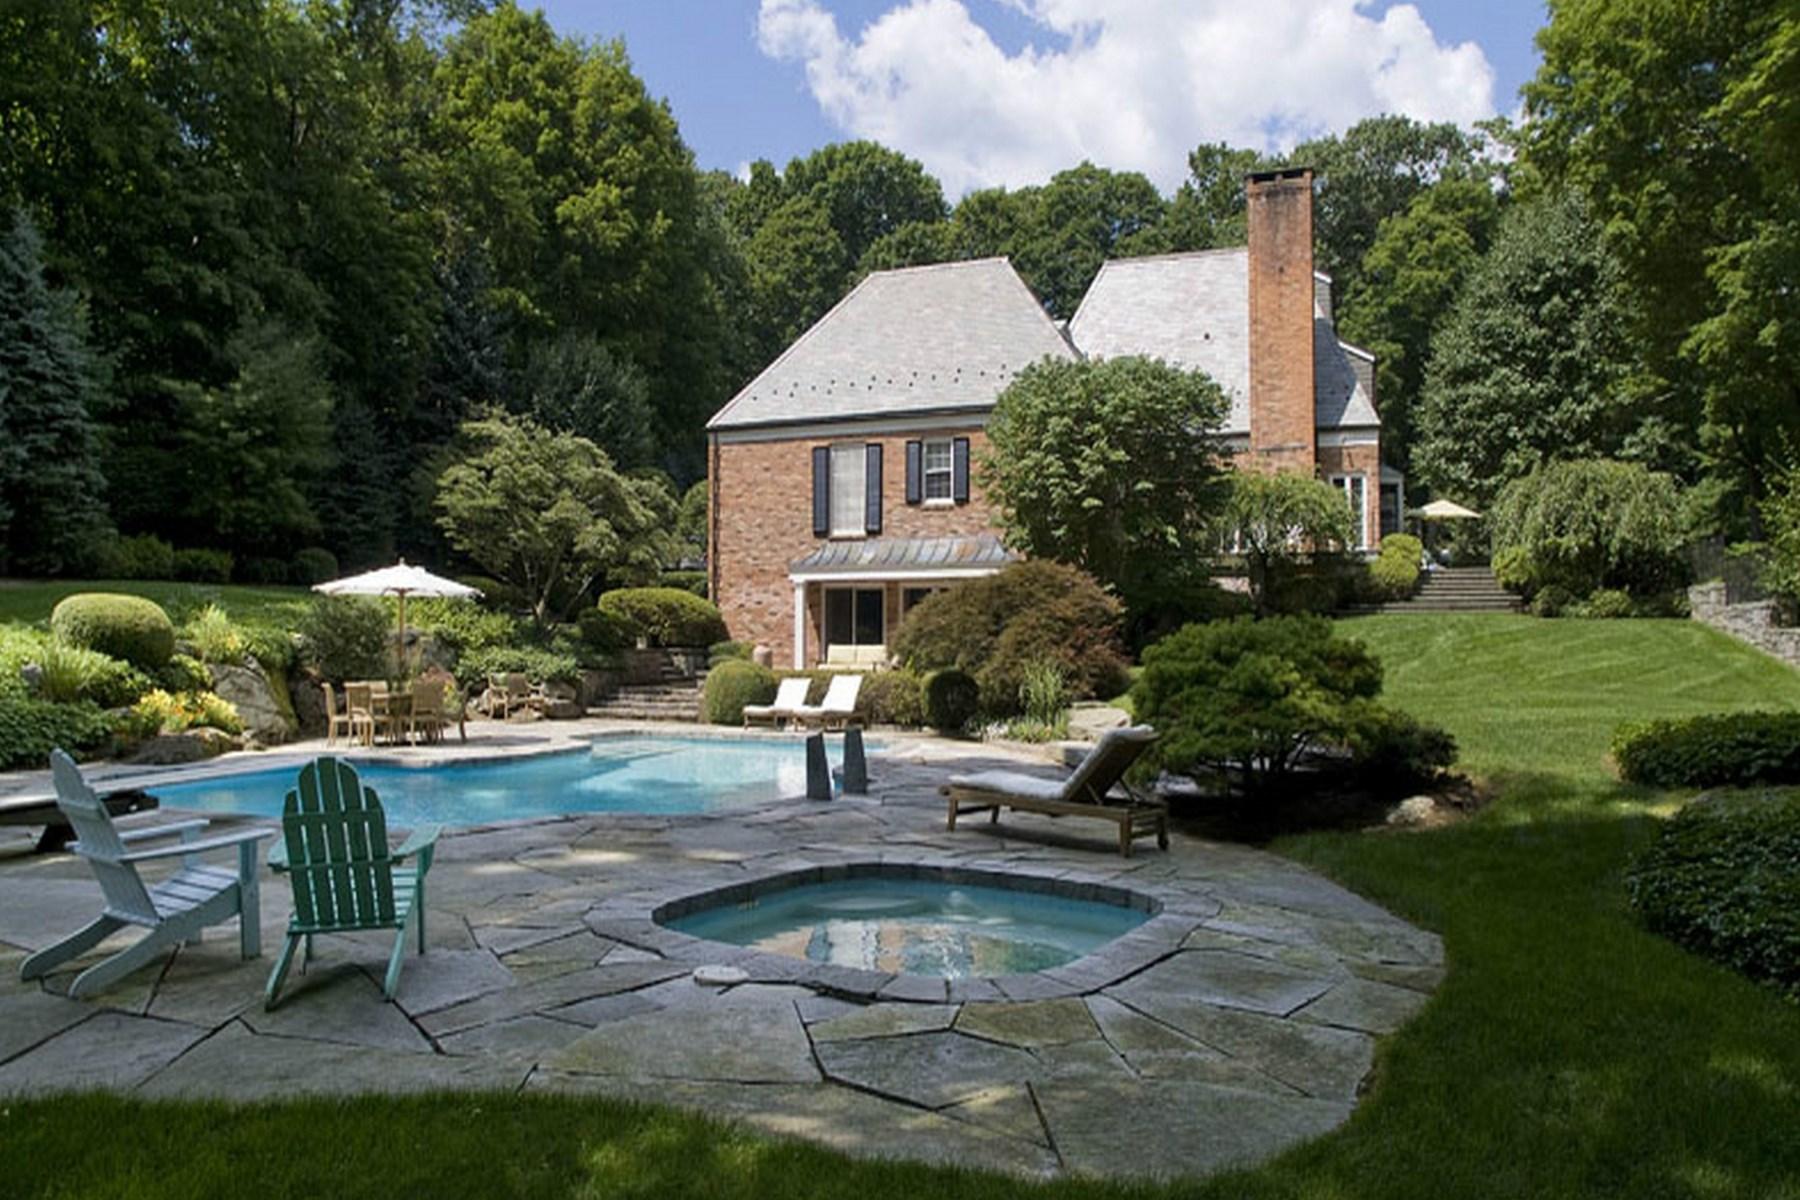 独户住宅 为 销售 在 Gorgeous Lake Views 31 Khakum Wood Drive South Of Parkway, Greenwich, 康涅狄格州 06831 美国